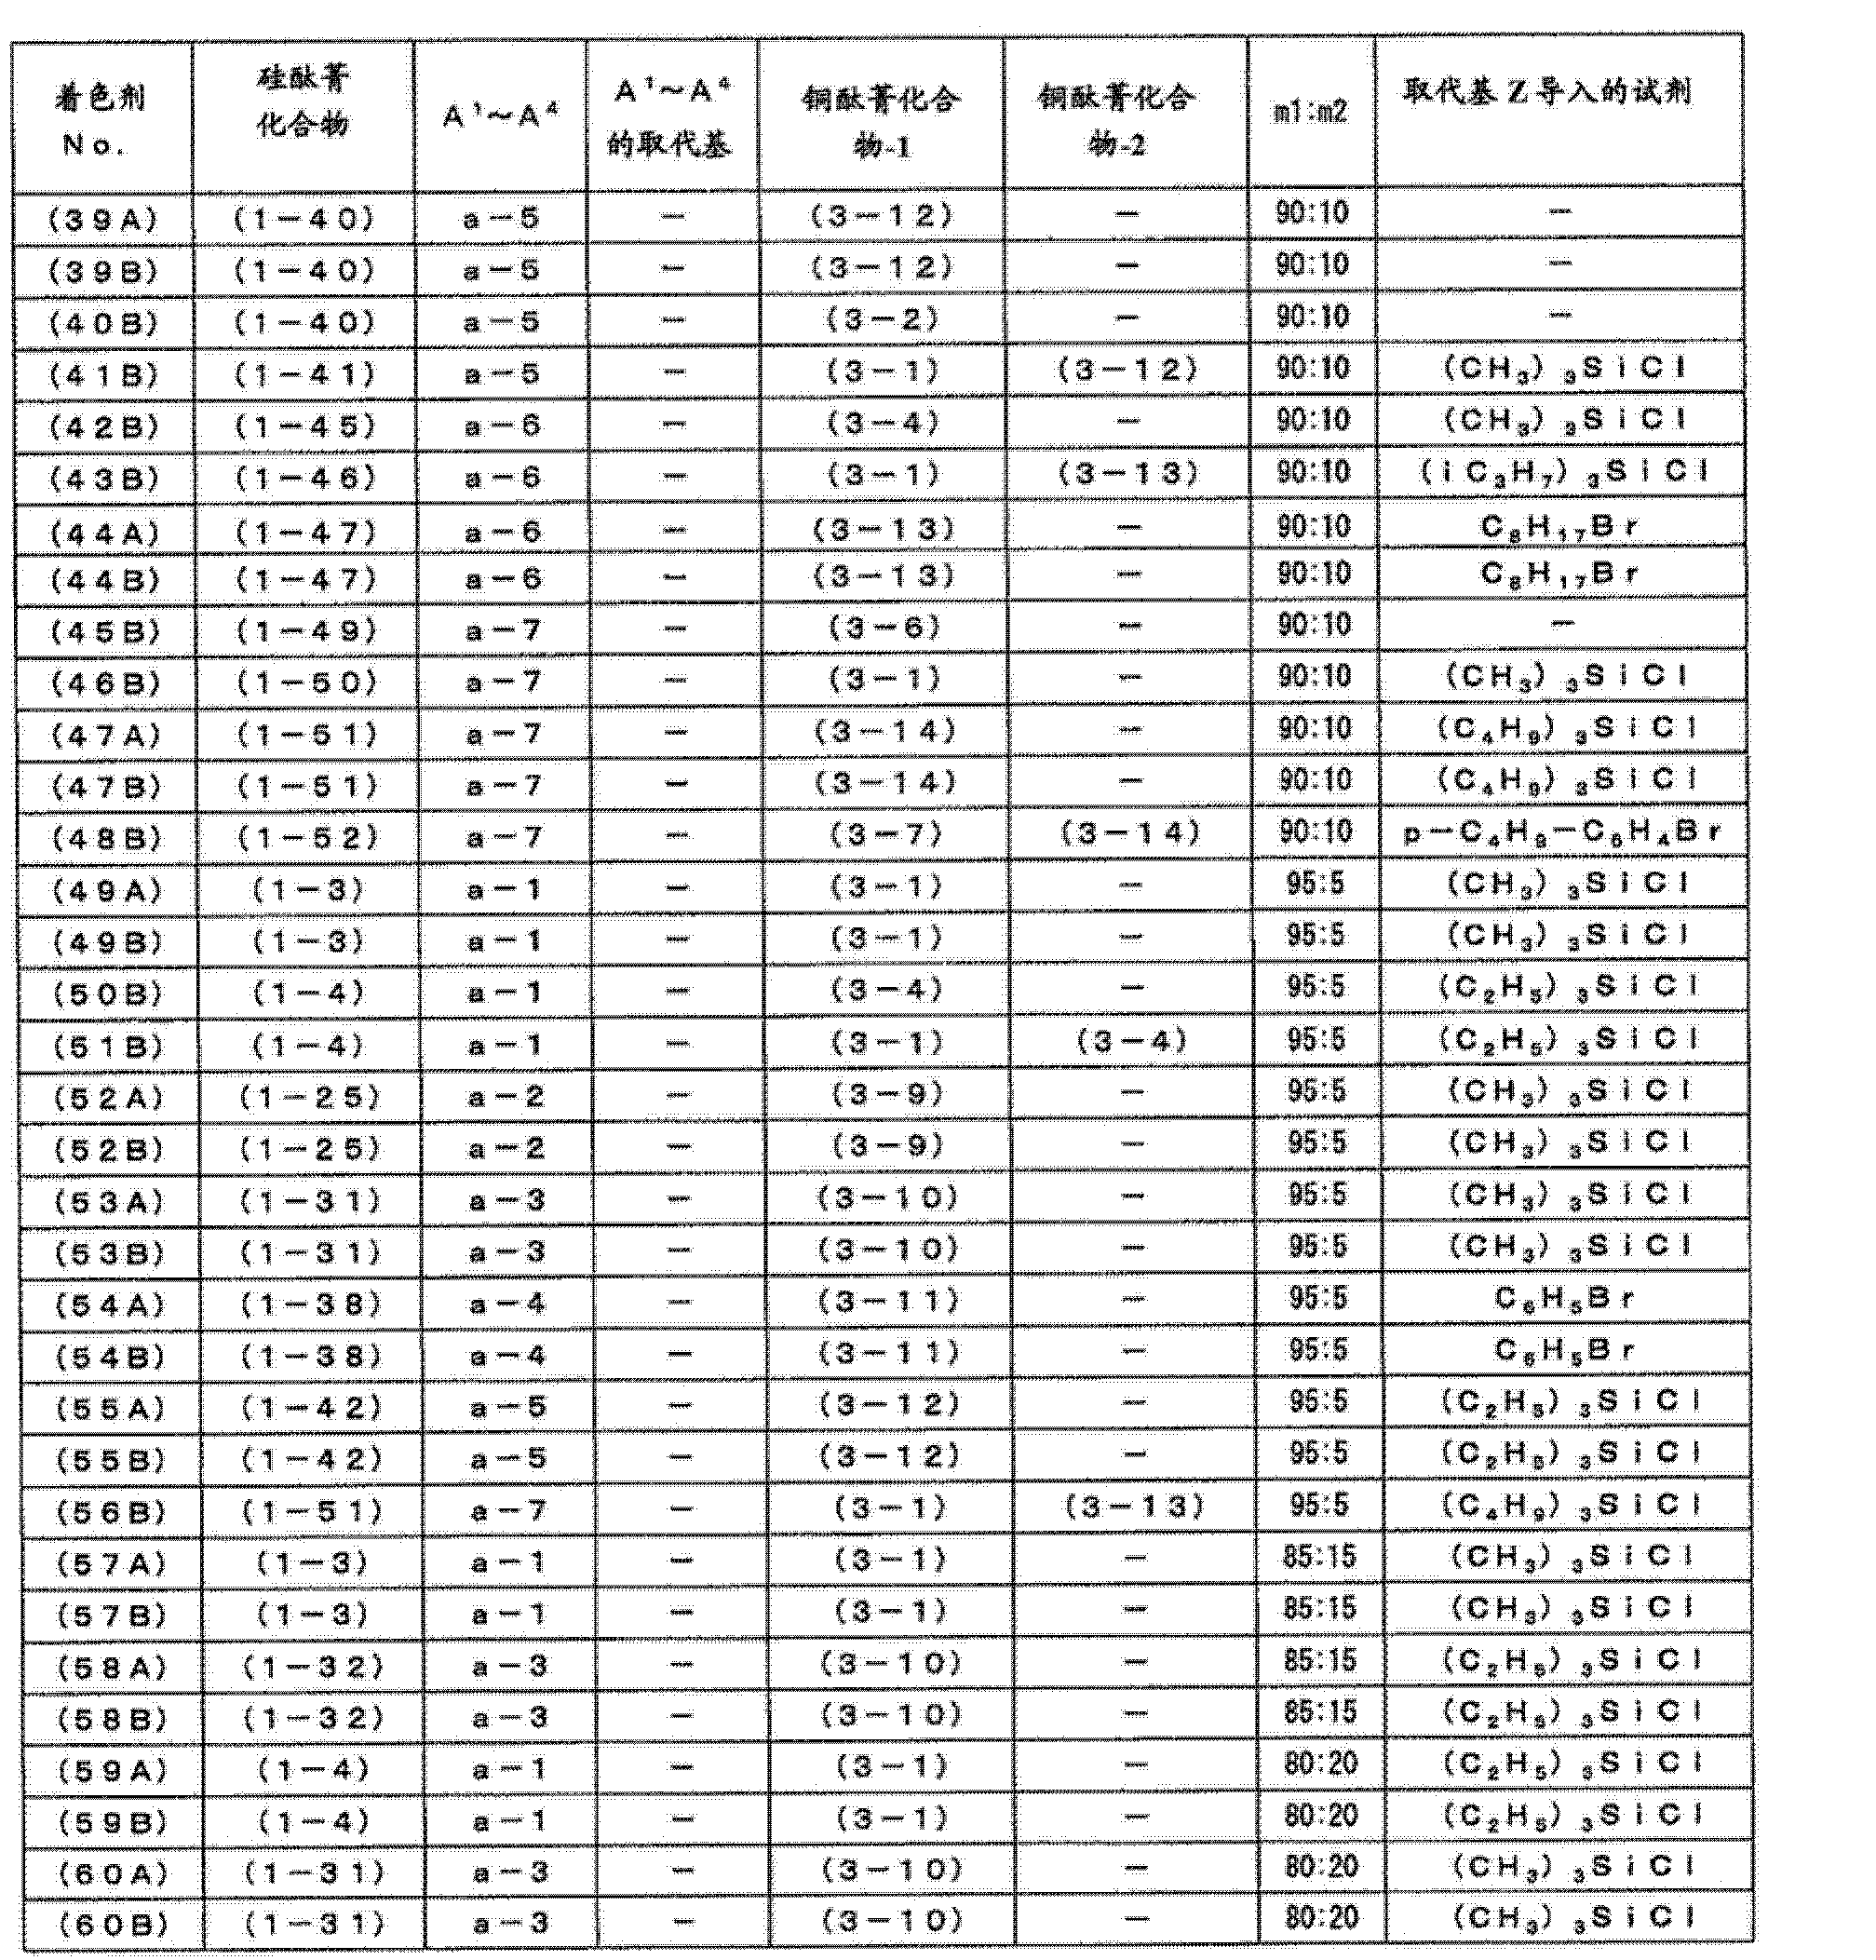 Cn103365133a Production Process For Colorant Composition Hikaru Anti Glare Xiaomi Redmi Note 4 4x Clear Figure Cn103365133ad00531